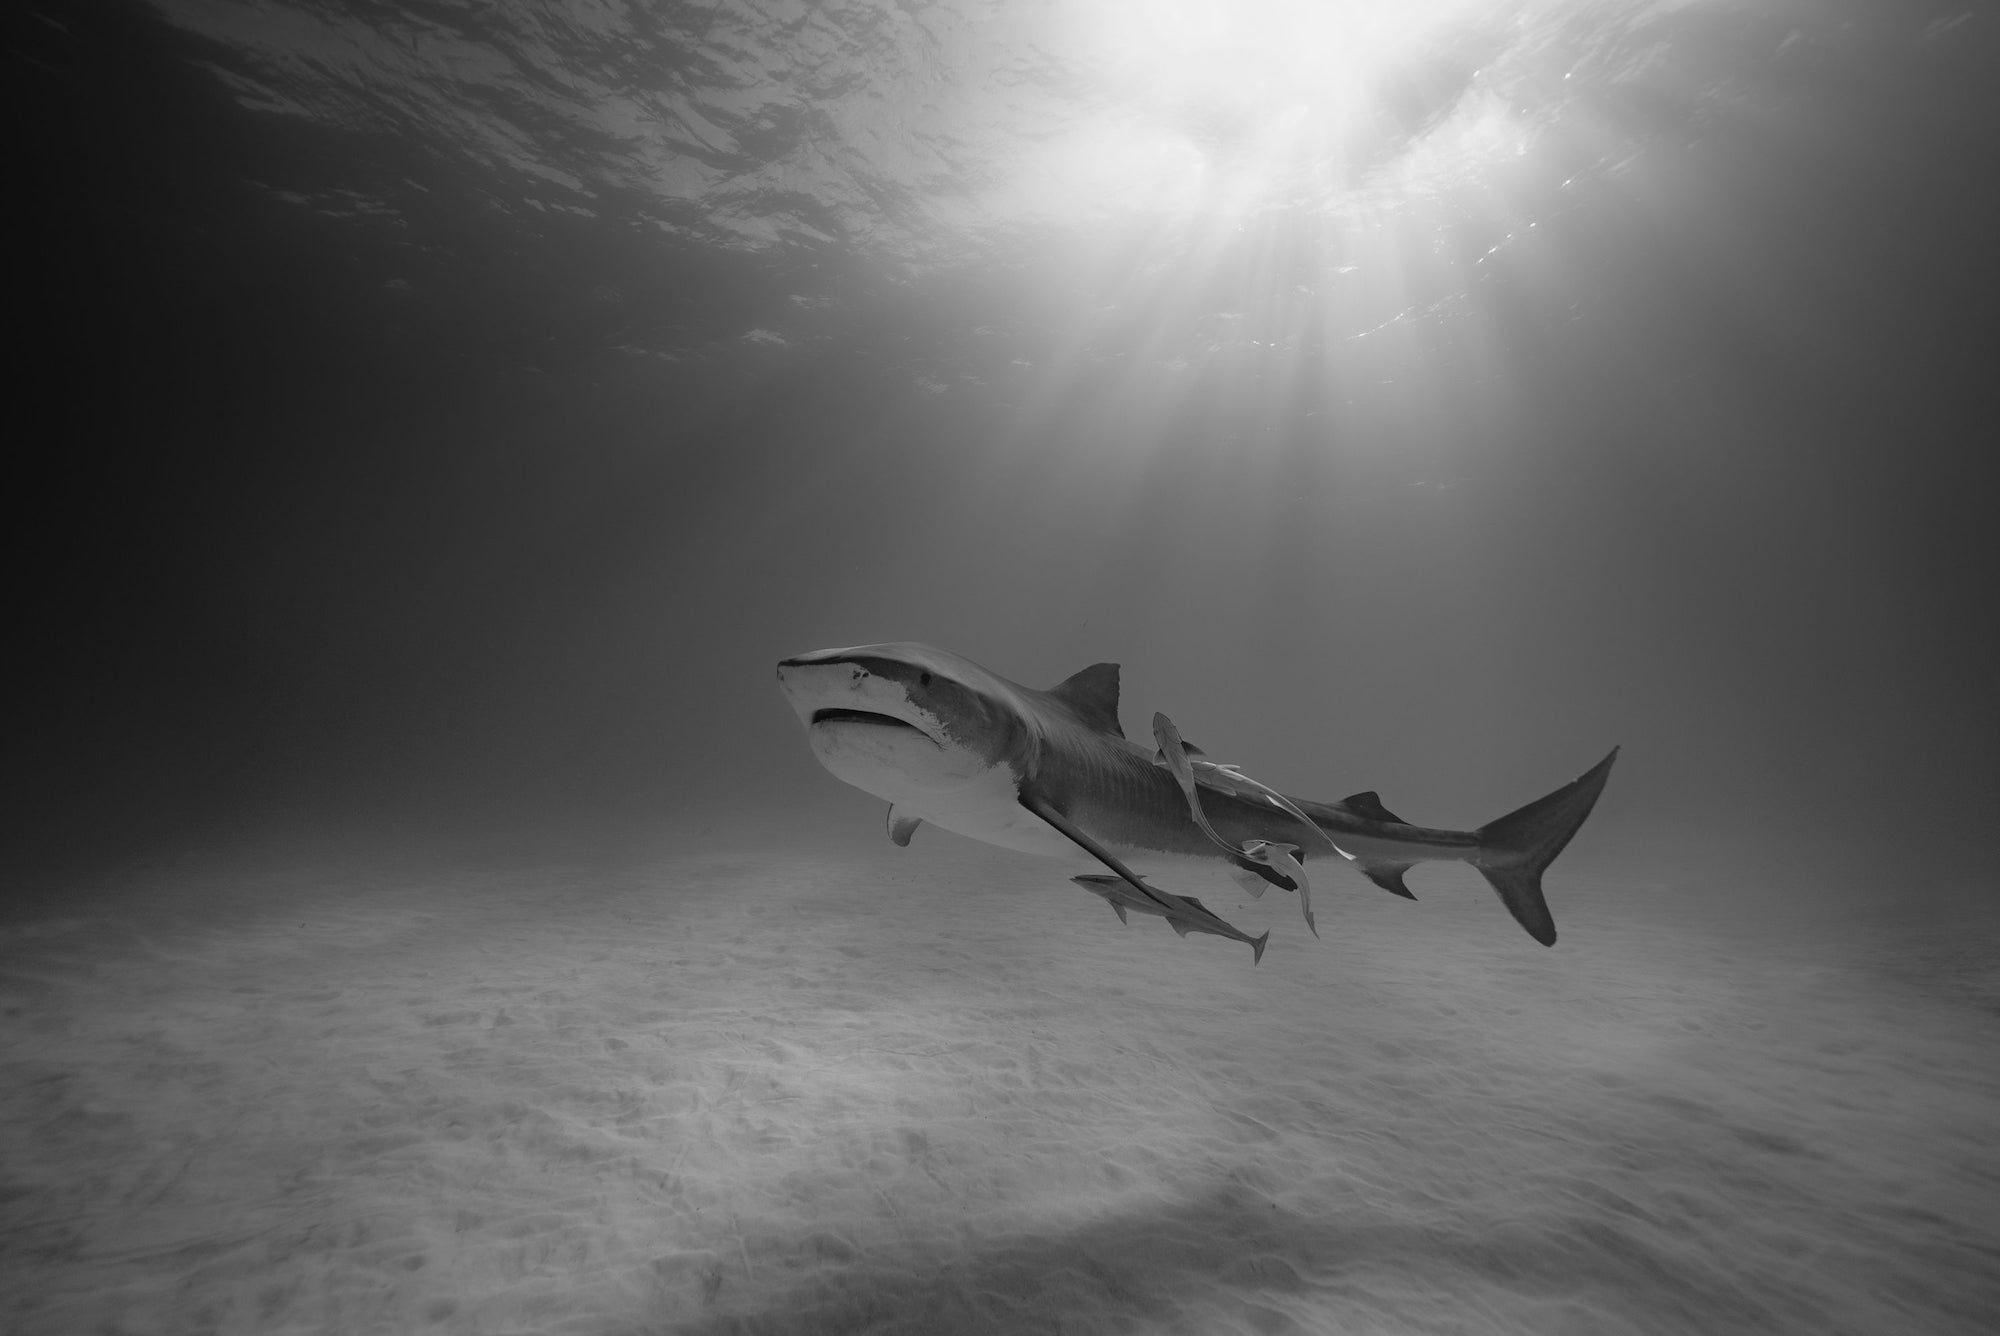 Alpha-Universe-Behind-The-Shot-Tiger-Shark-Paul-Nicklen.jpg